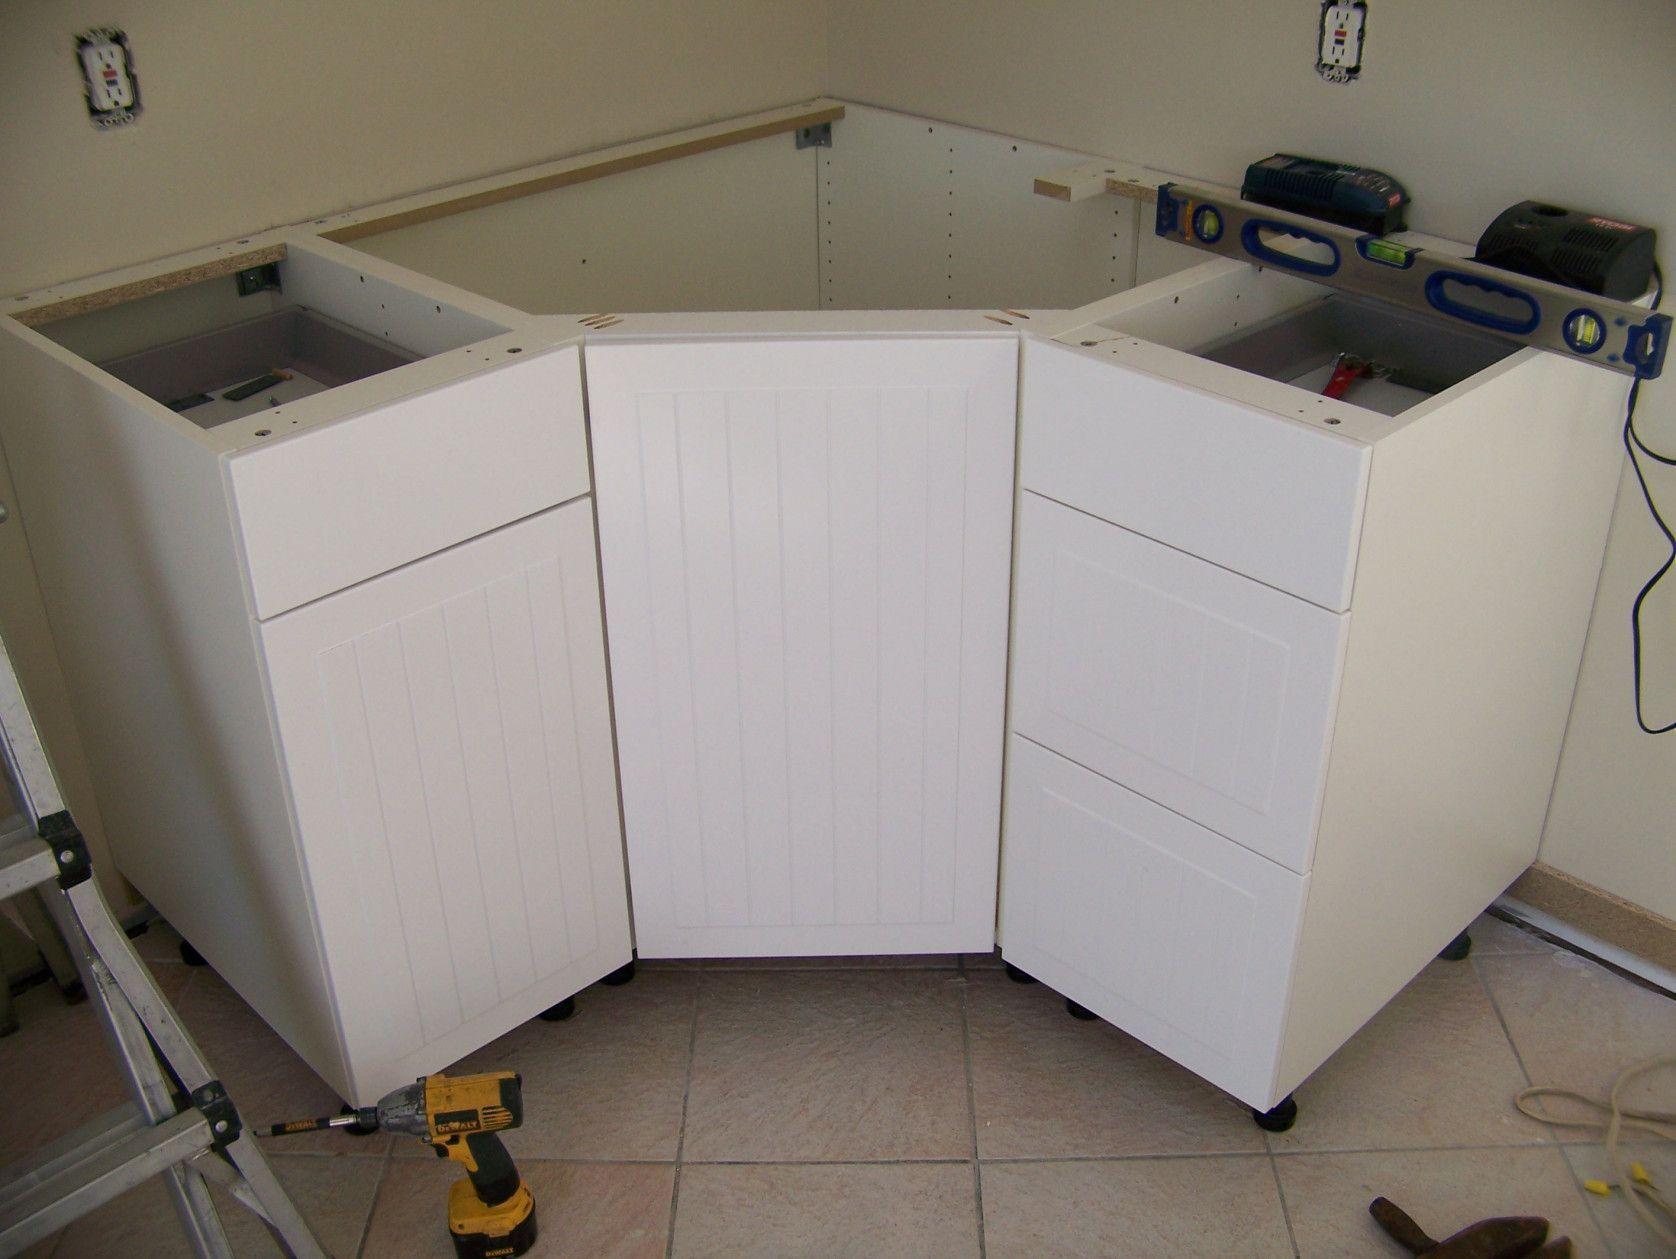 Pin By Lisa Clerie On Vinyl Flooring Pics Corner Sink Kitchen Corner Kitchen Cabinet Corner Sink